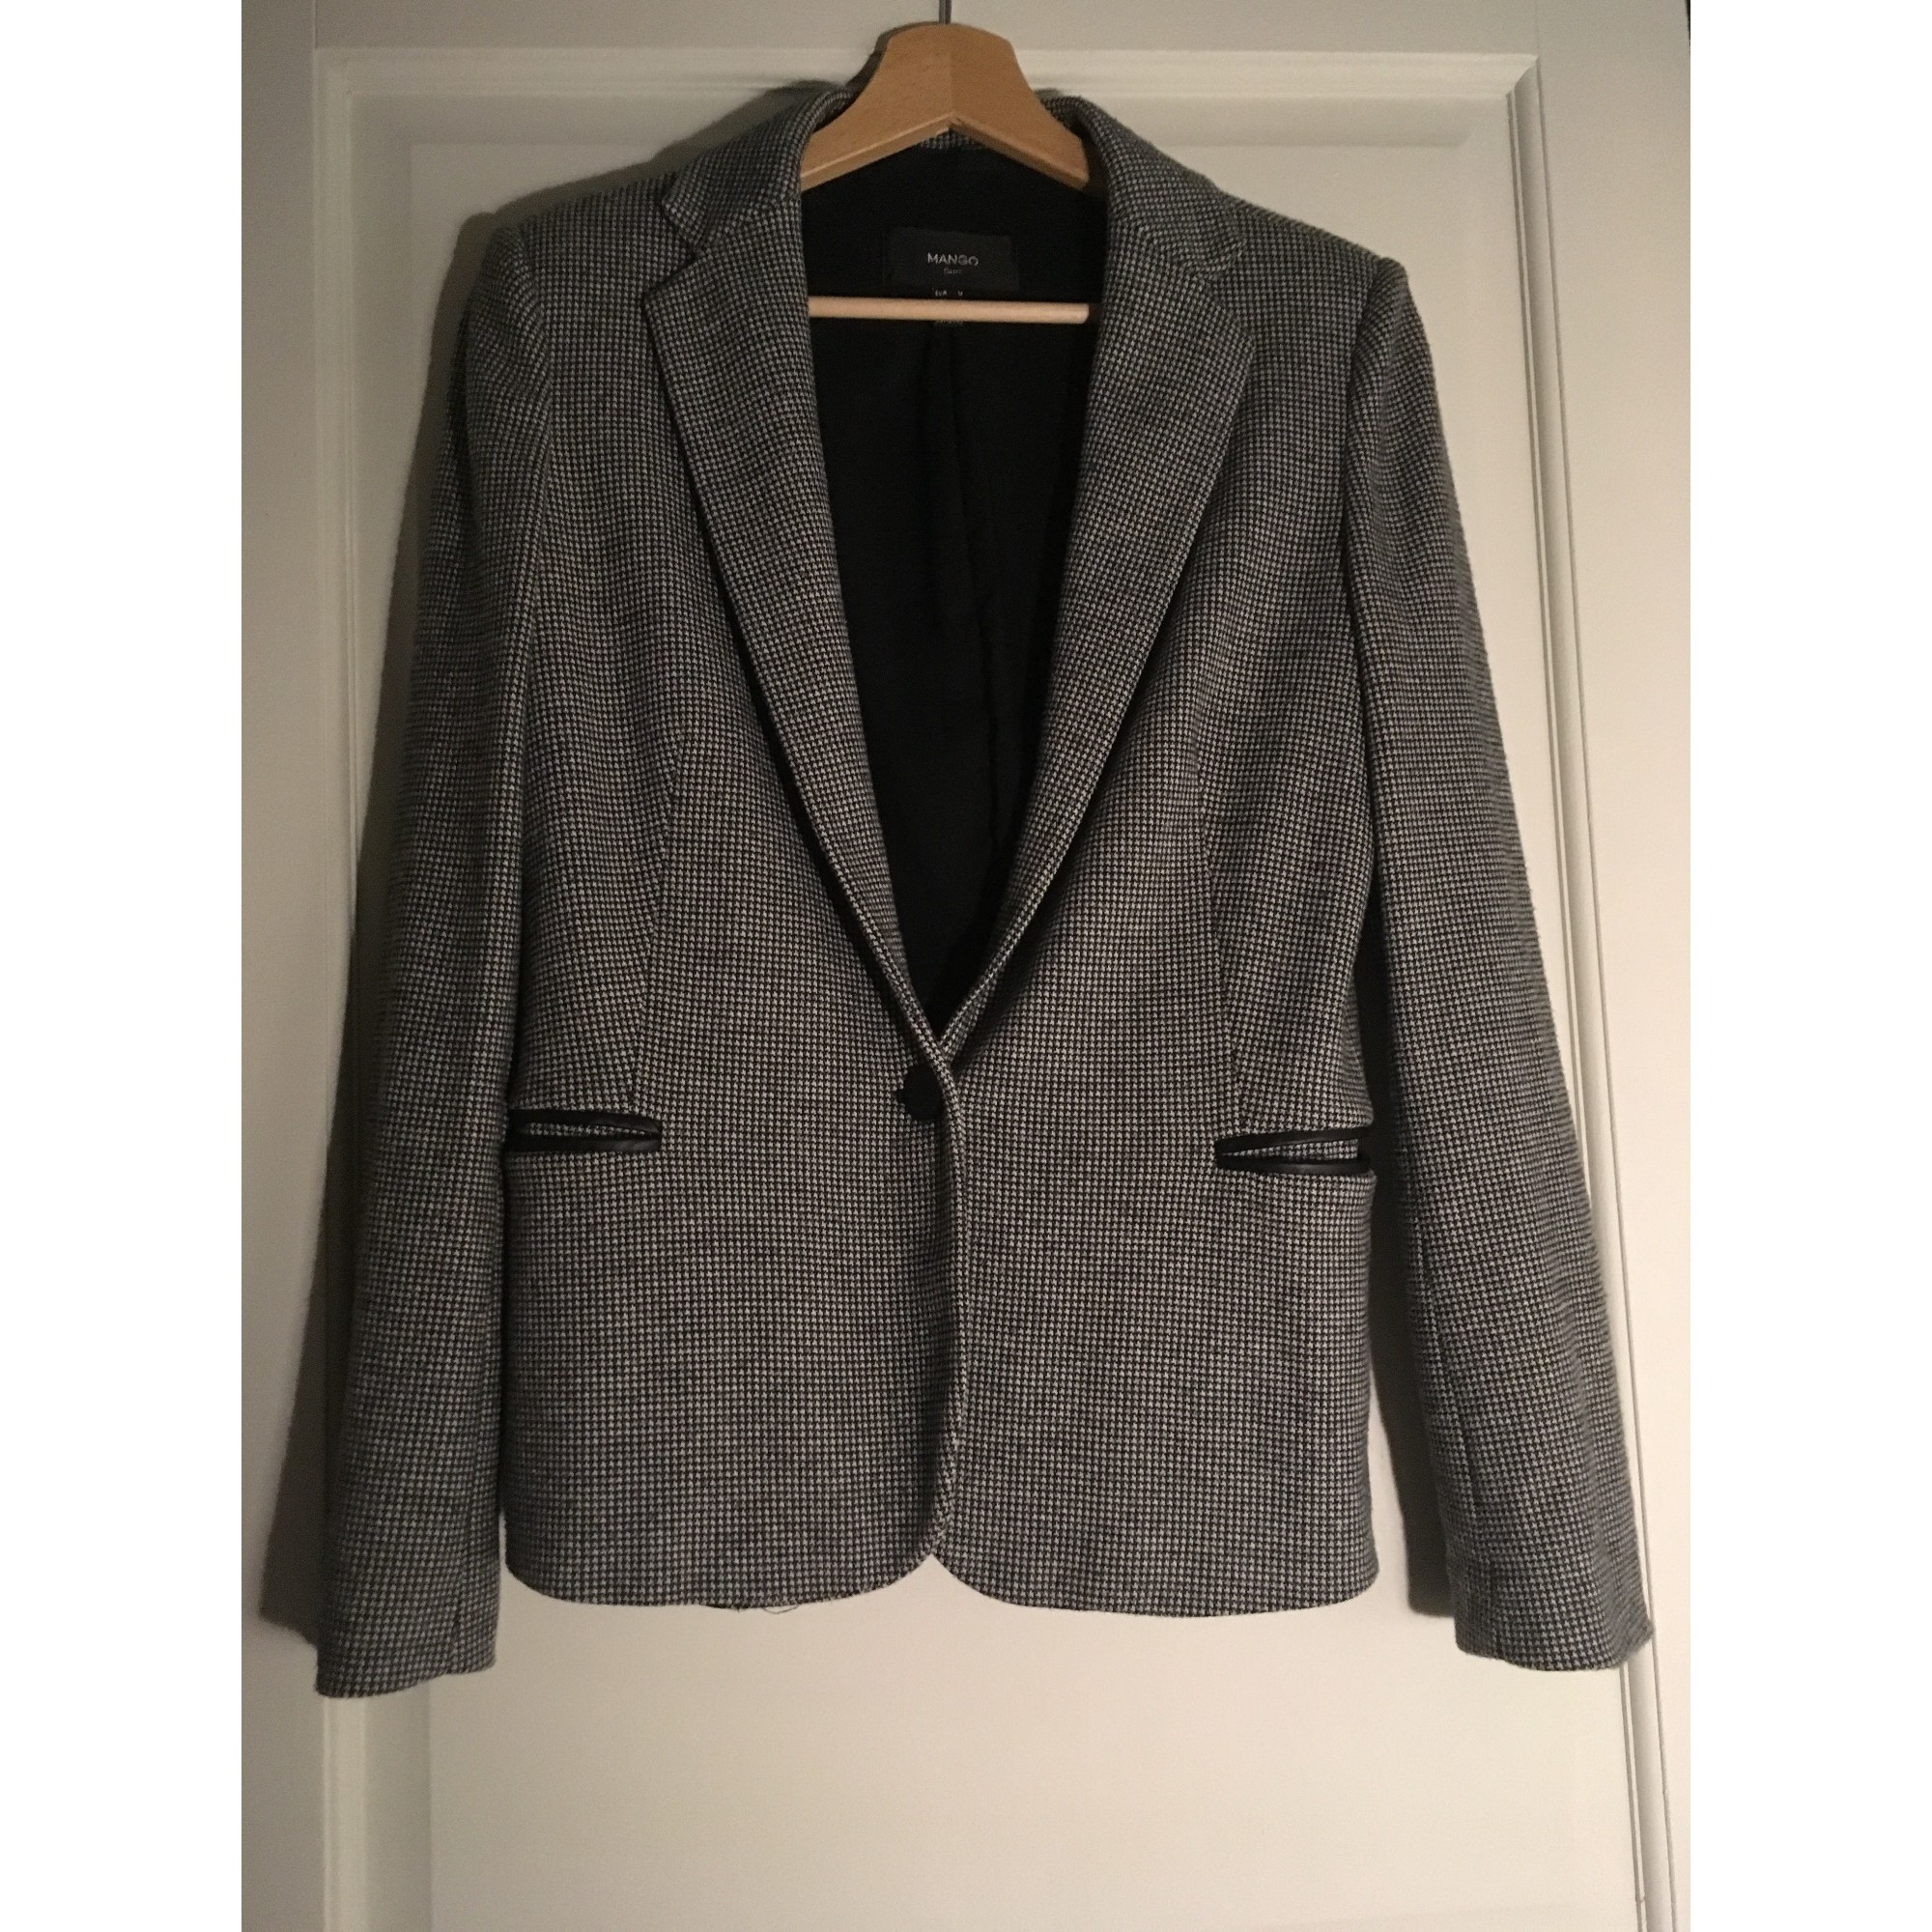 Blazer, veste tailleur MANGO Gris, anthracite